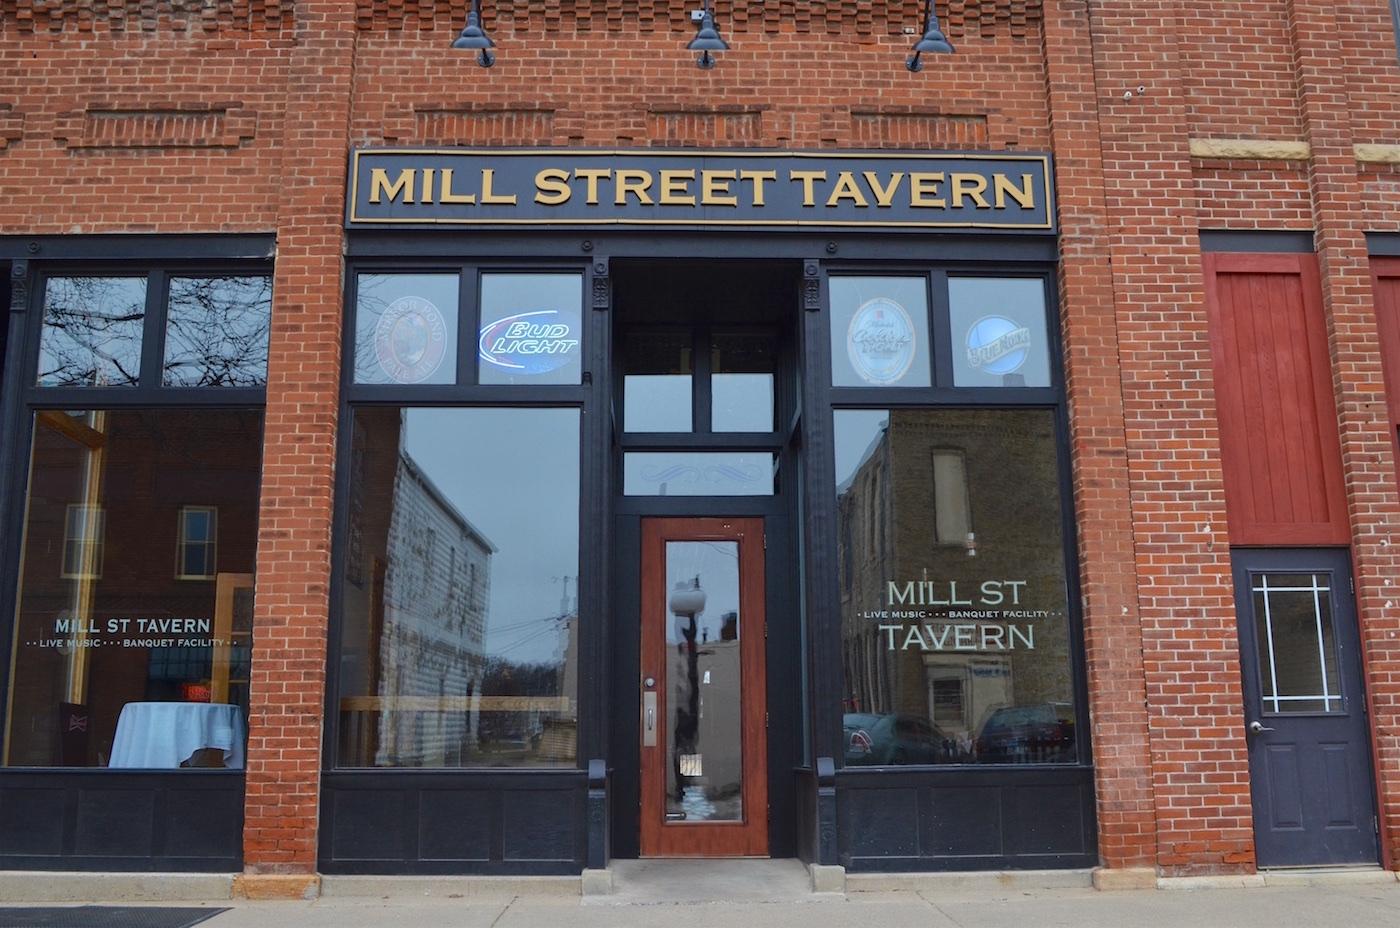 Mill Street Tavern storefront